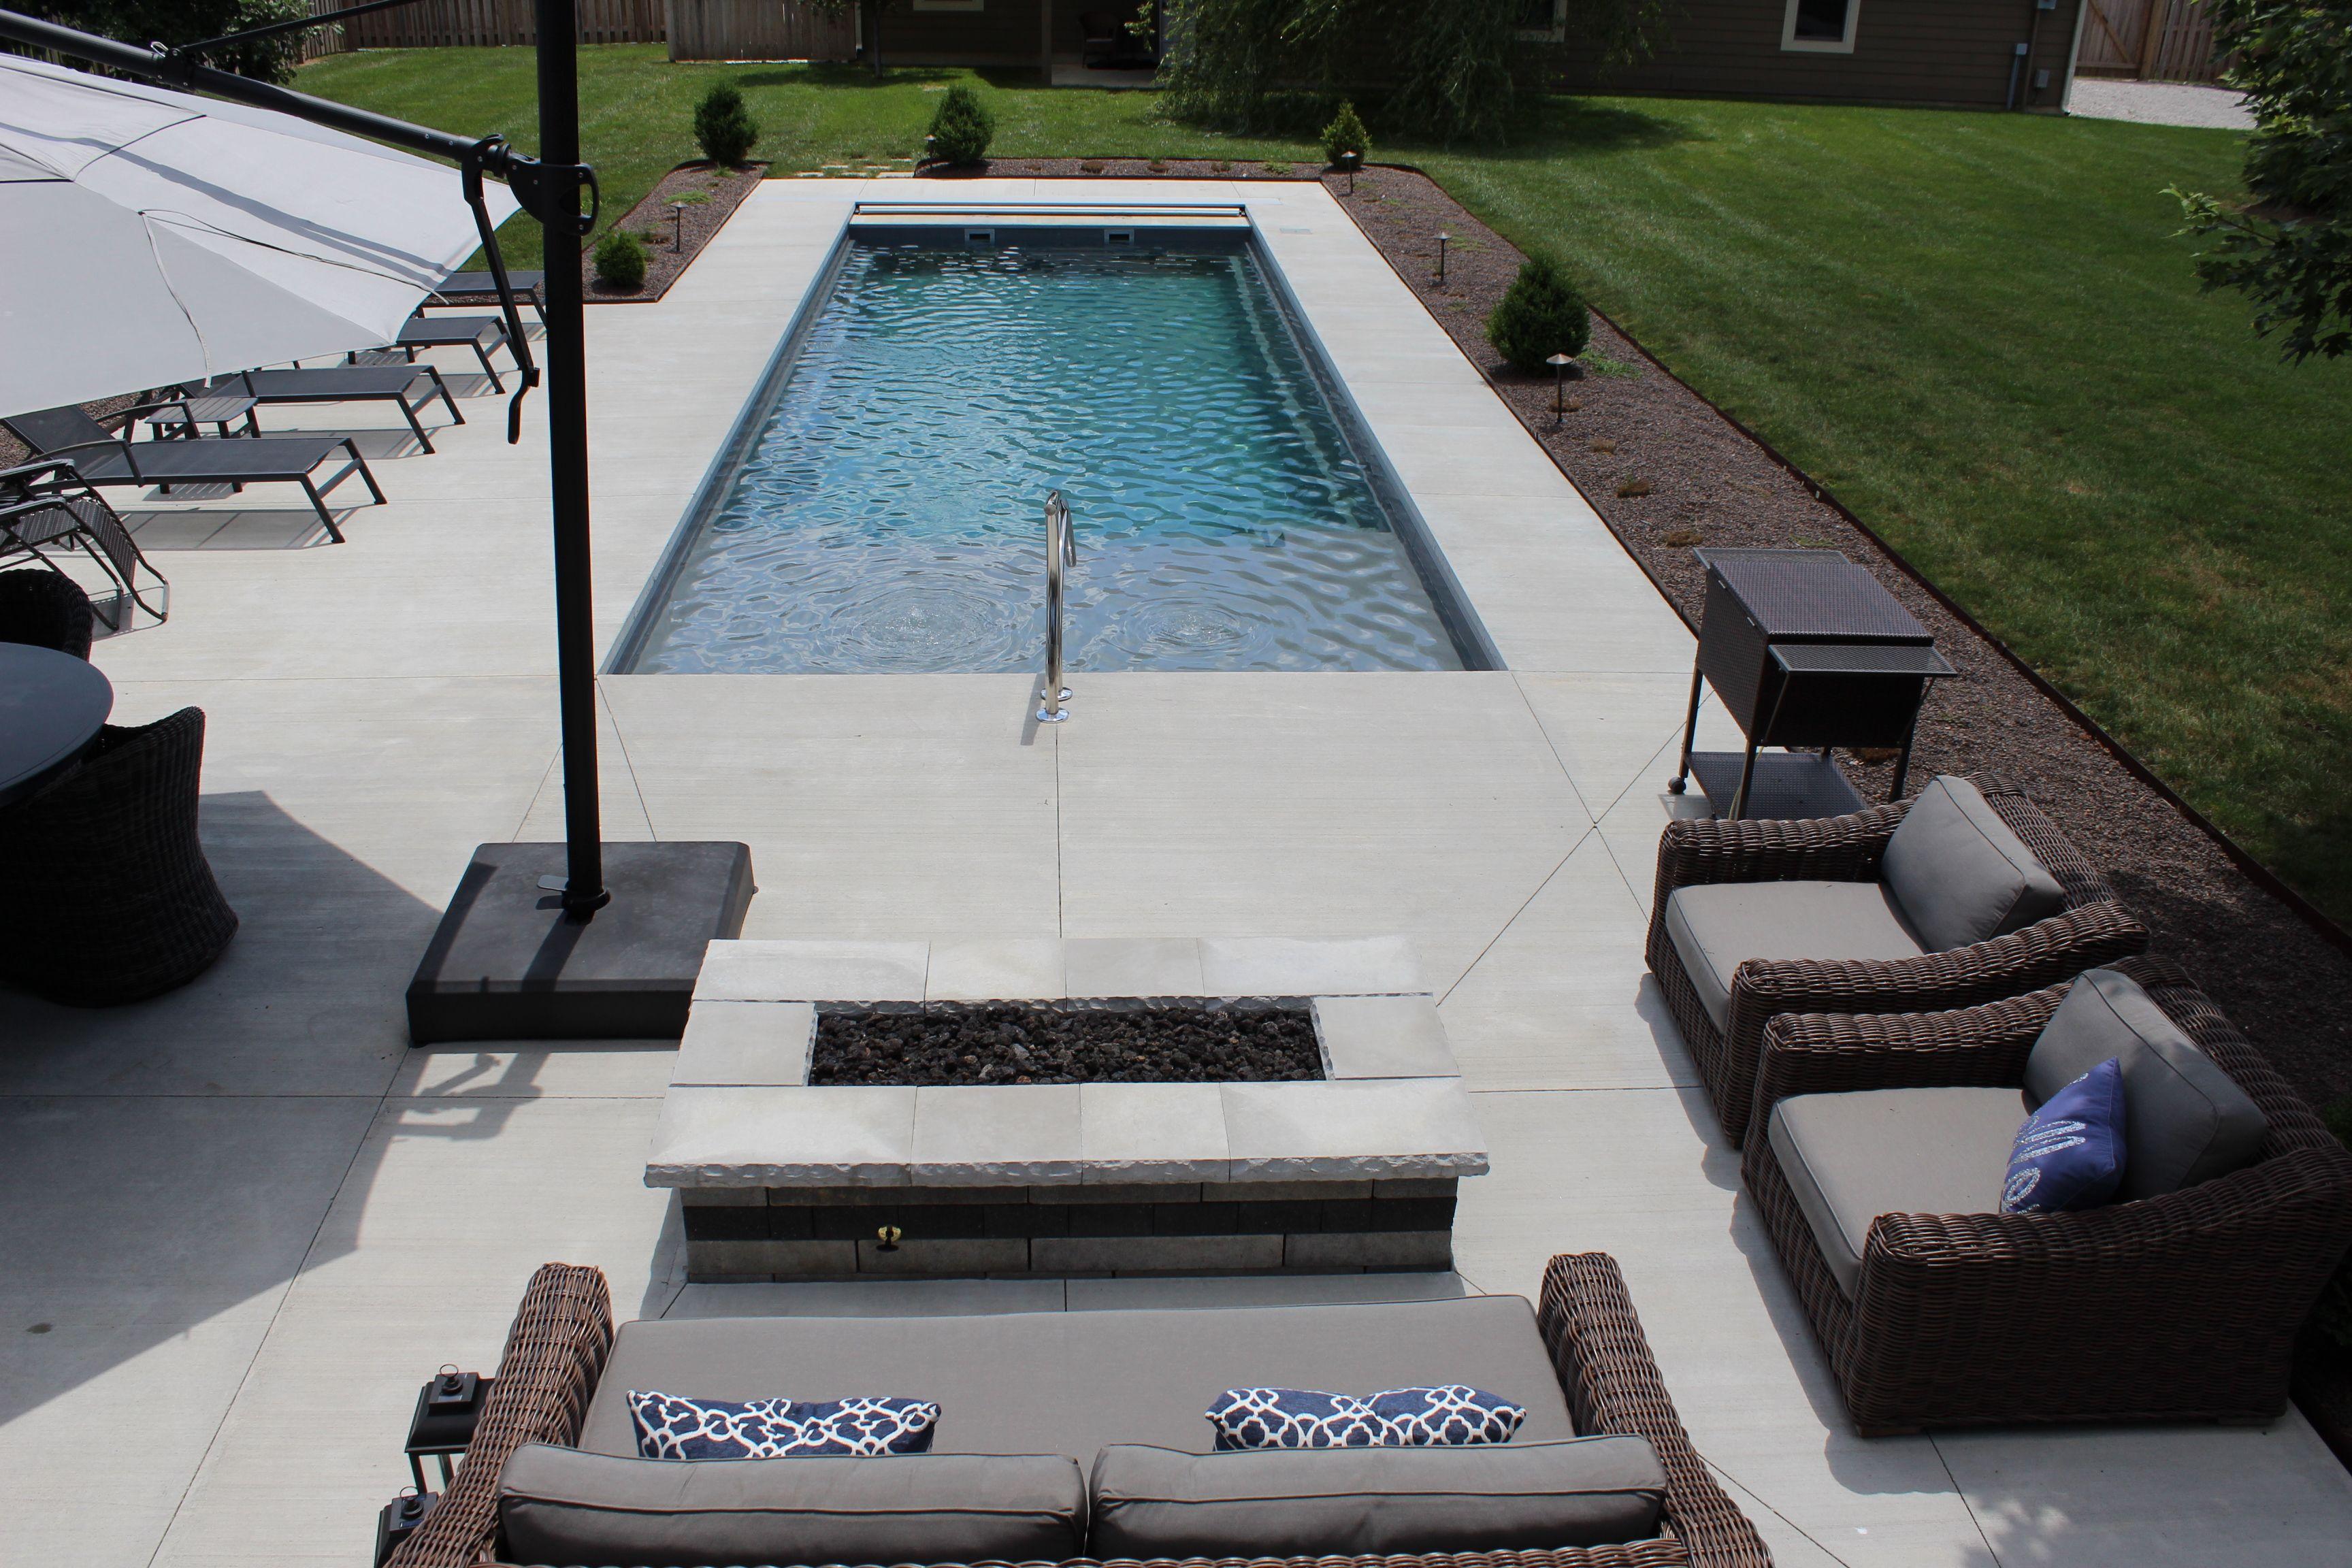 Enjoy Life At Its Best With The Imagine Pools Freedom With Splash Pad Fiberglass Swimming Pool L Fiberglass Swimming Pools Swimming Pools Fiberglass Pools